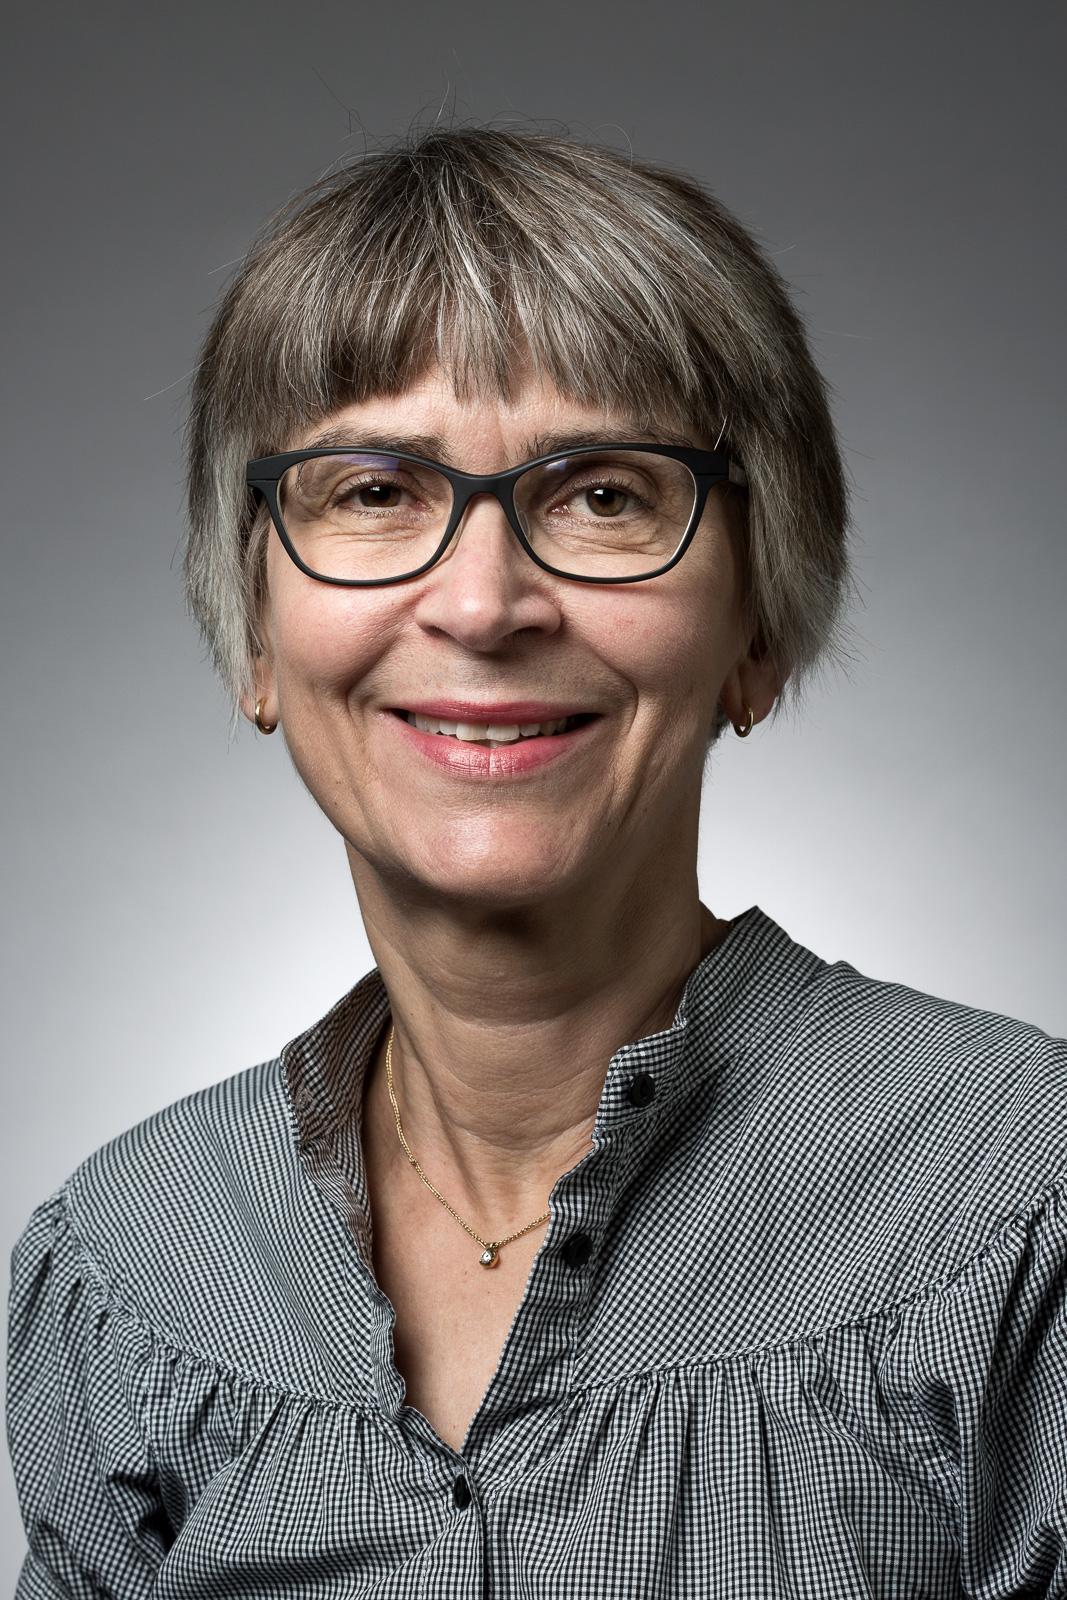 Karen Harbo